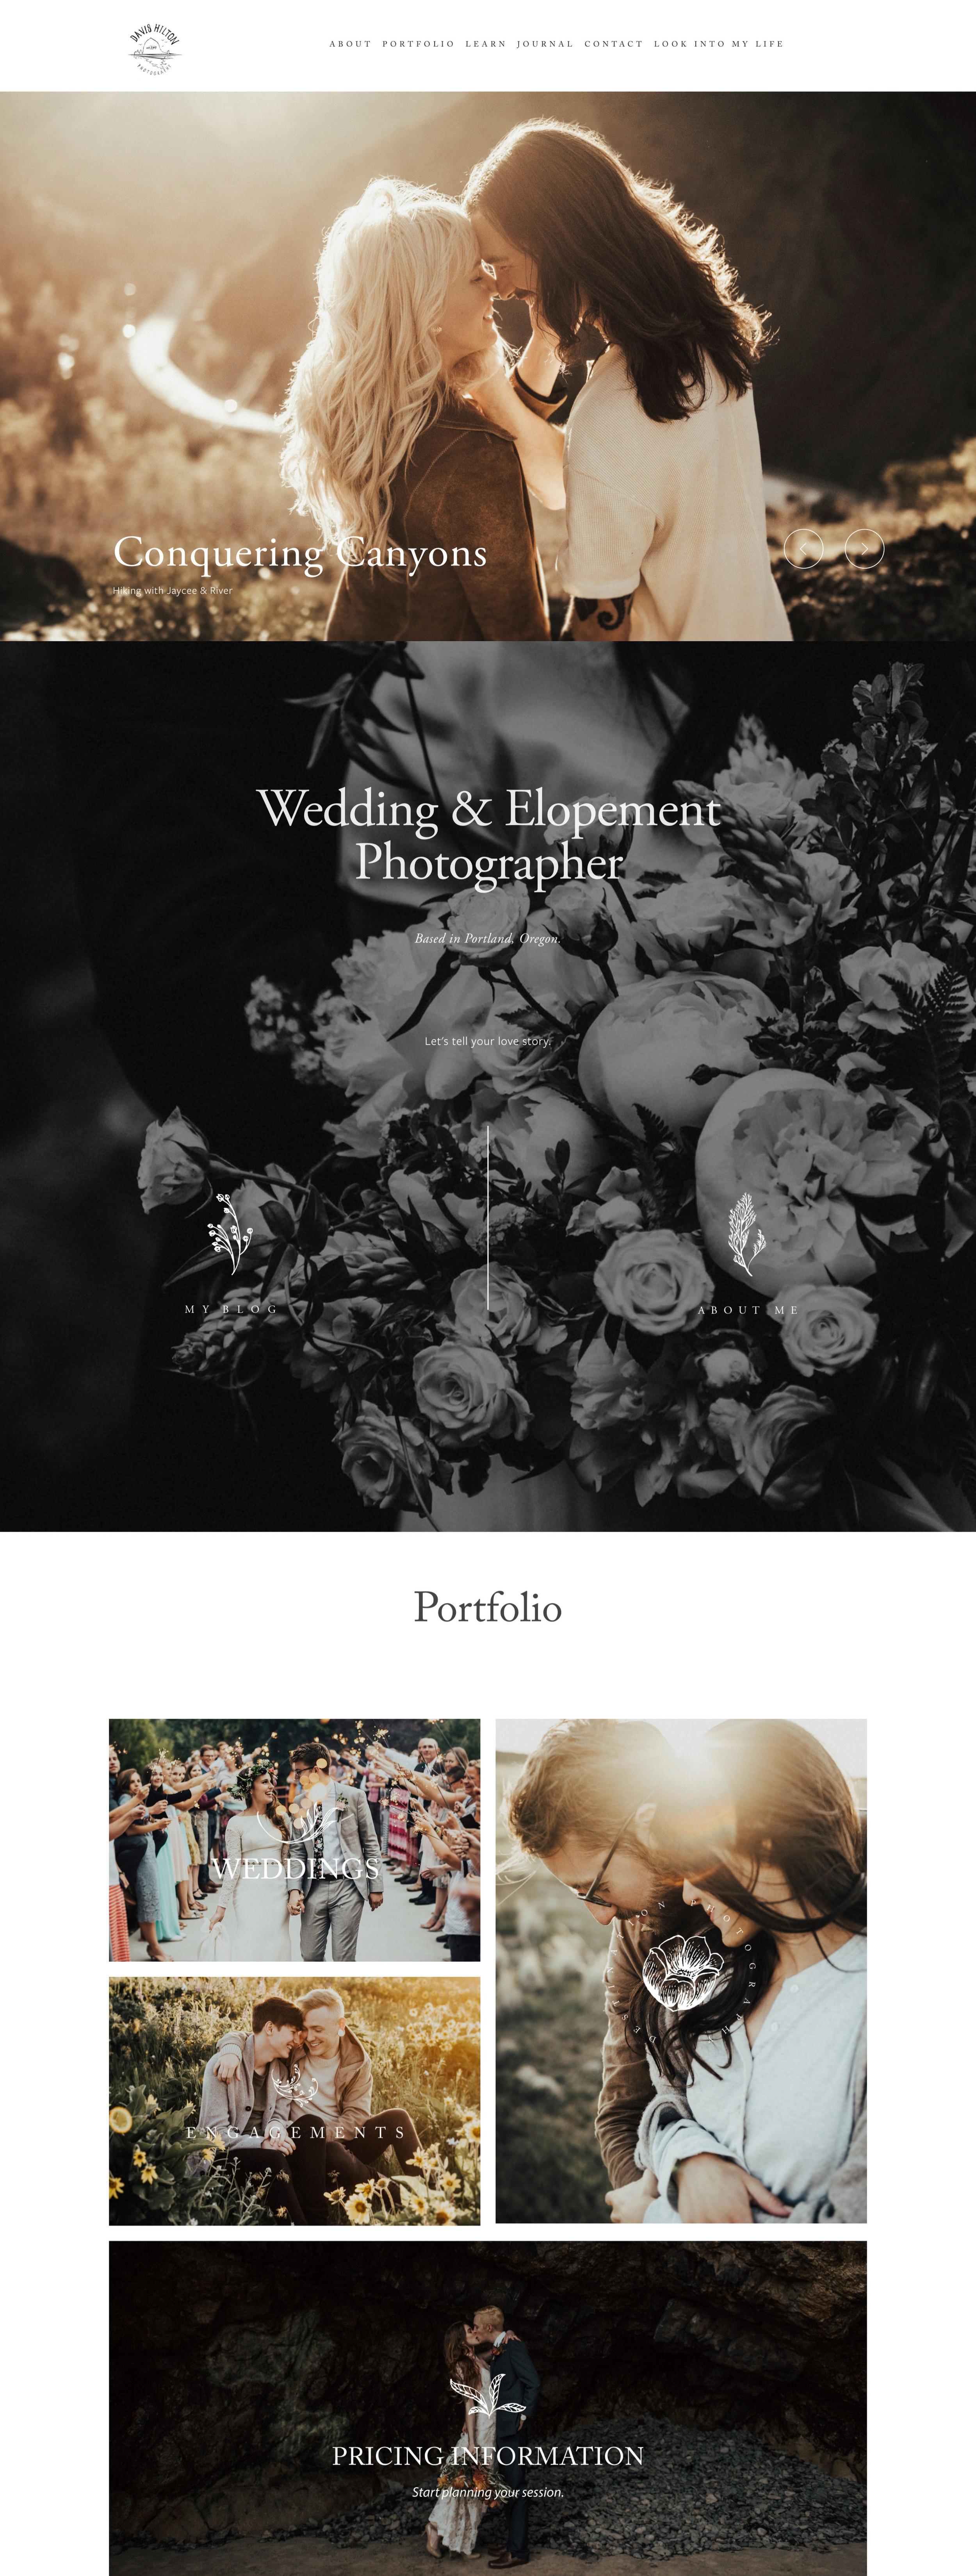 davishilton-website.jpg